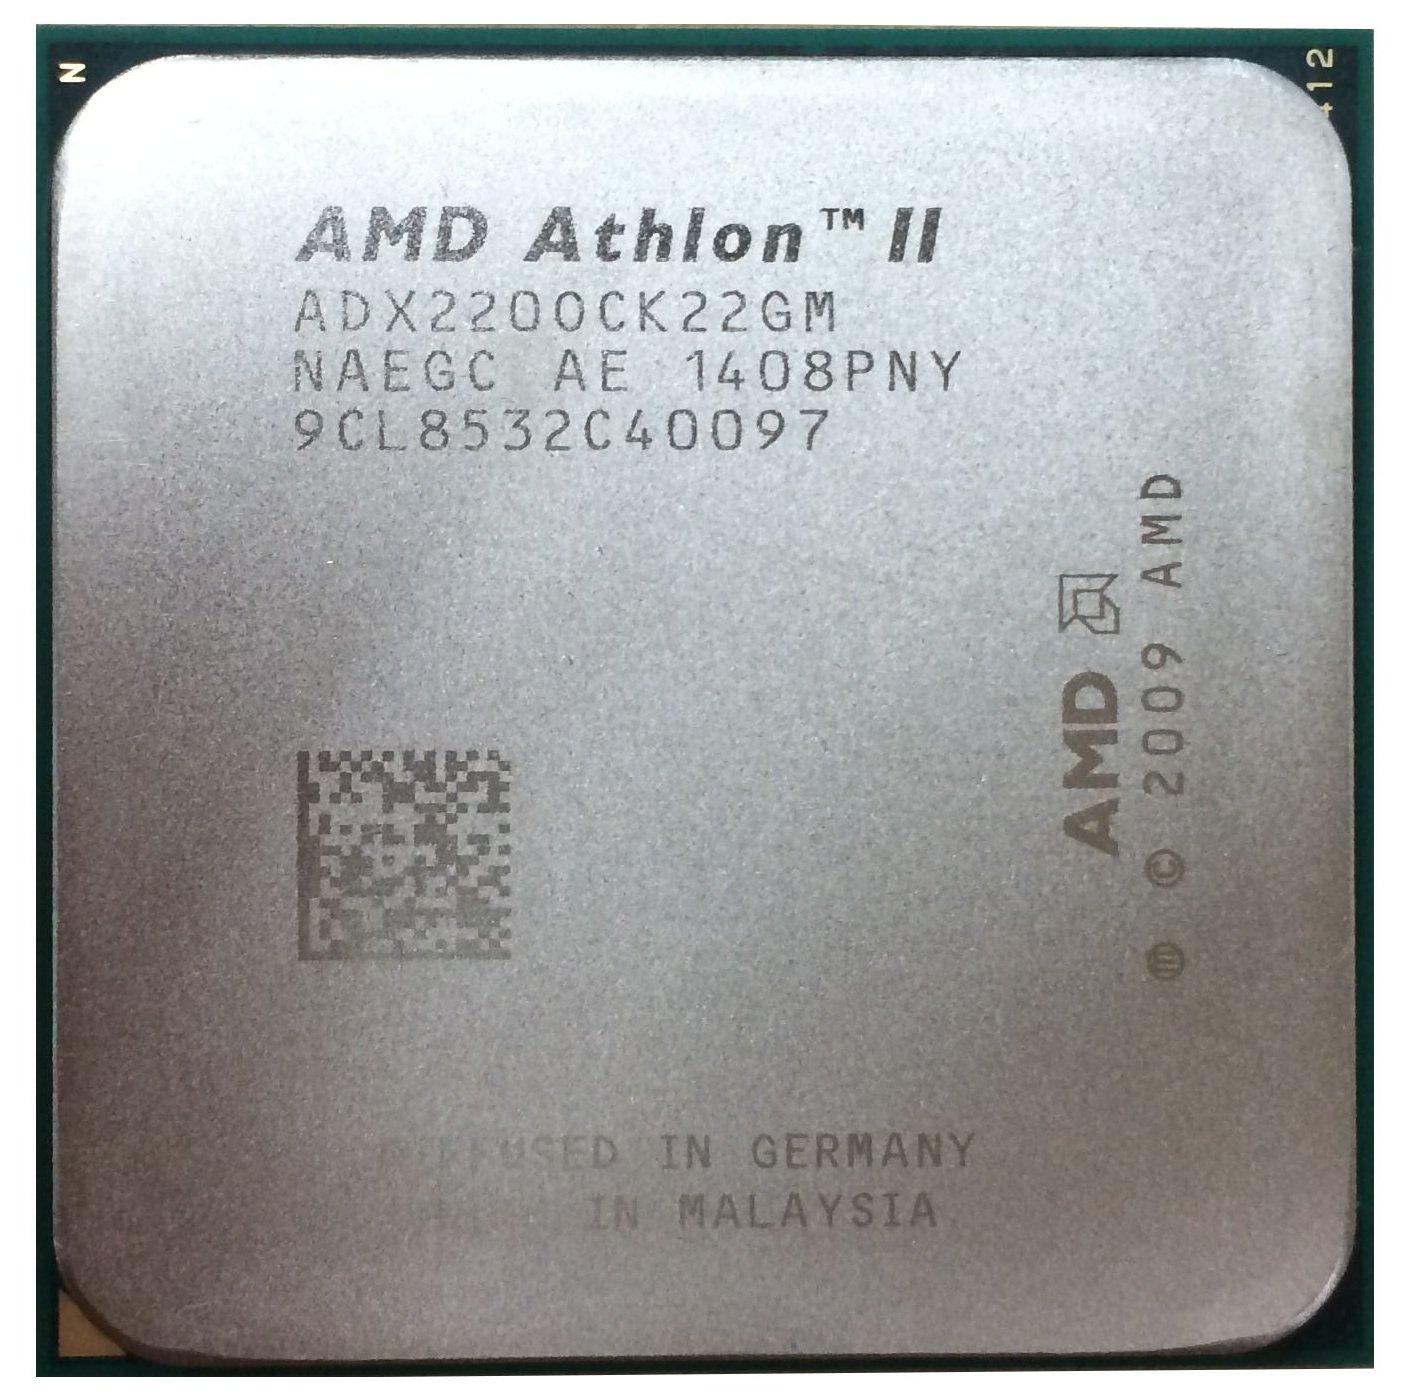 AMD Athlon II X2 220 2.8GHz 2x512KB Socket AM3 Dual-Core CPU